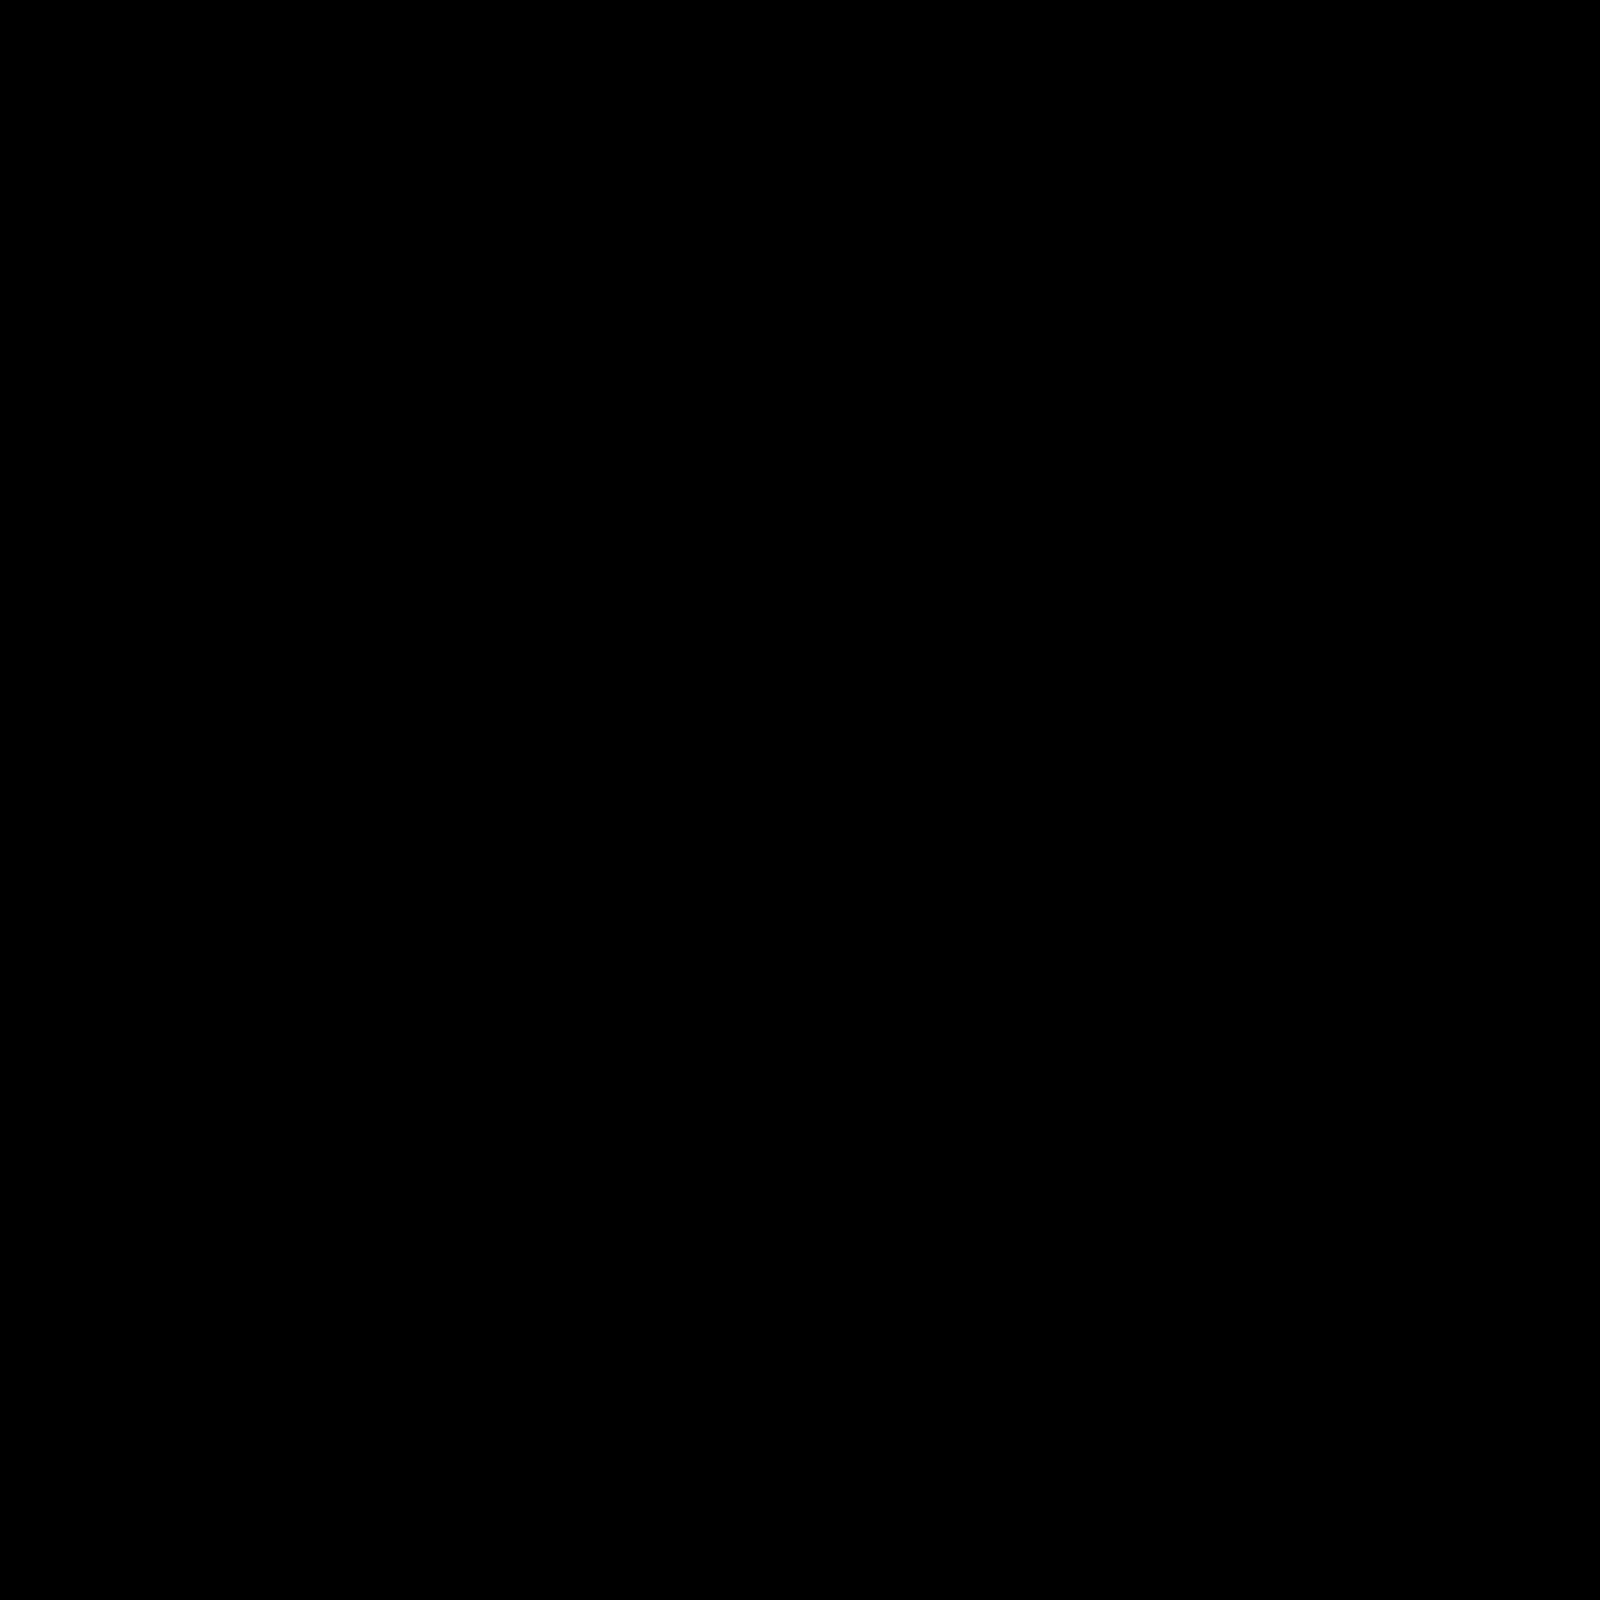 Nfl Logo Vector